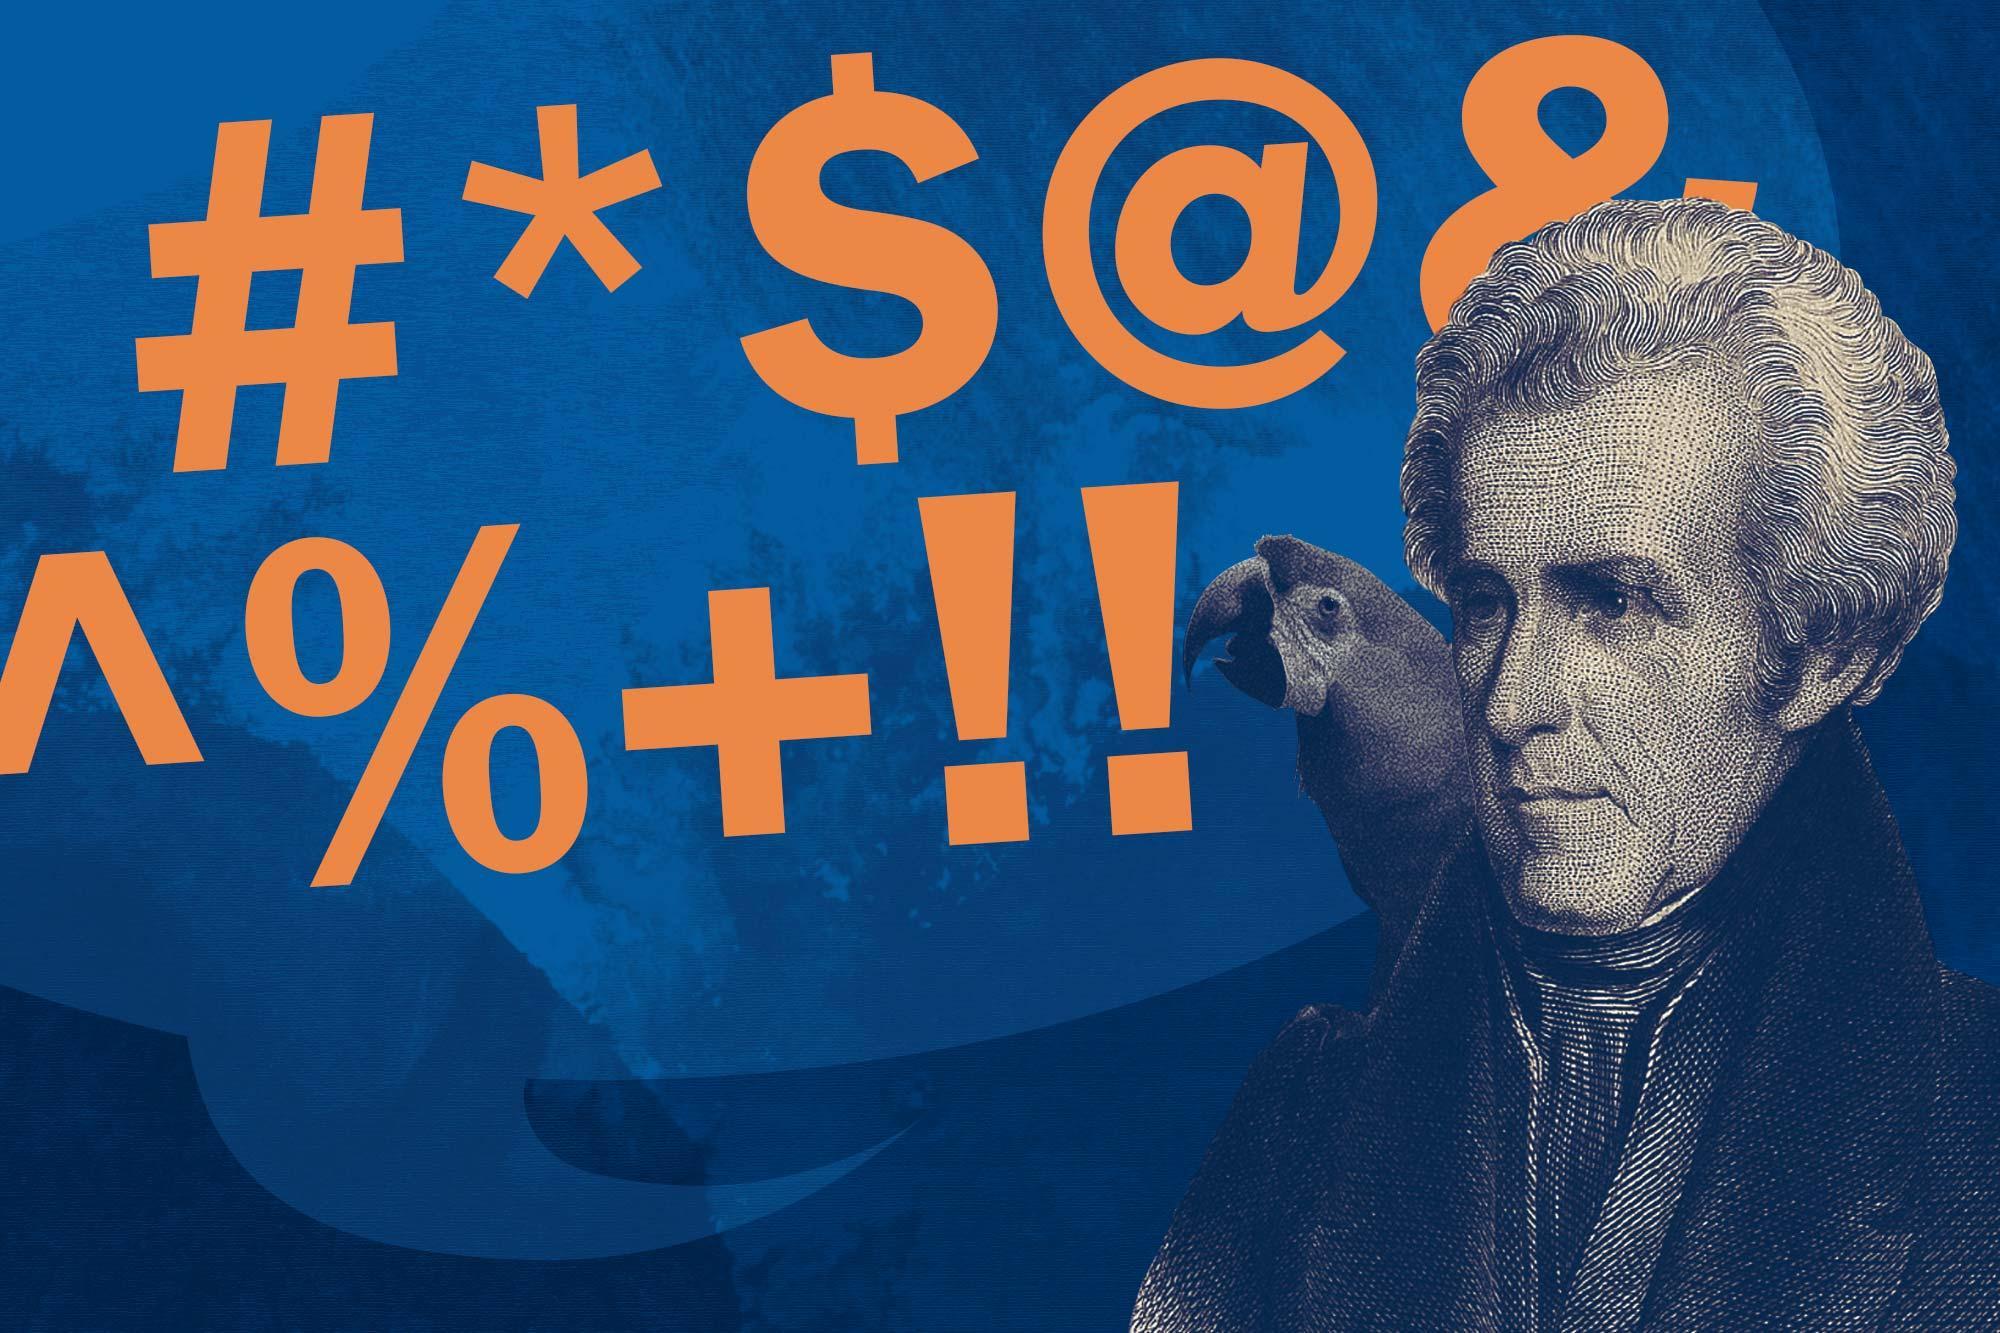 President Andrew Jackson's swearing parrot.